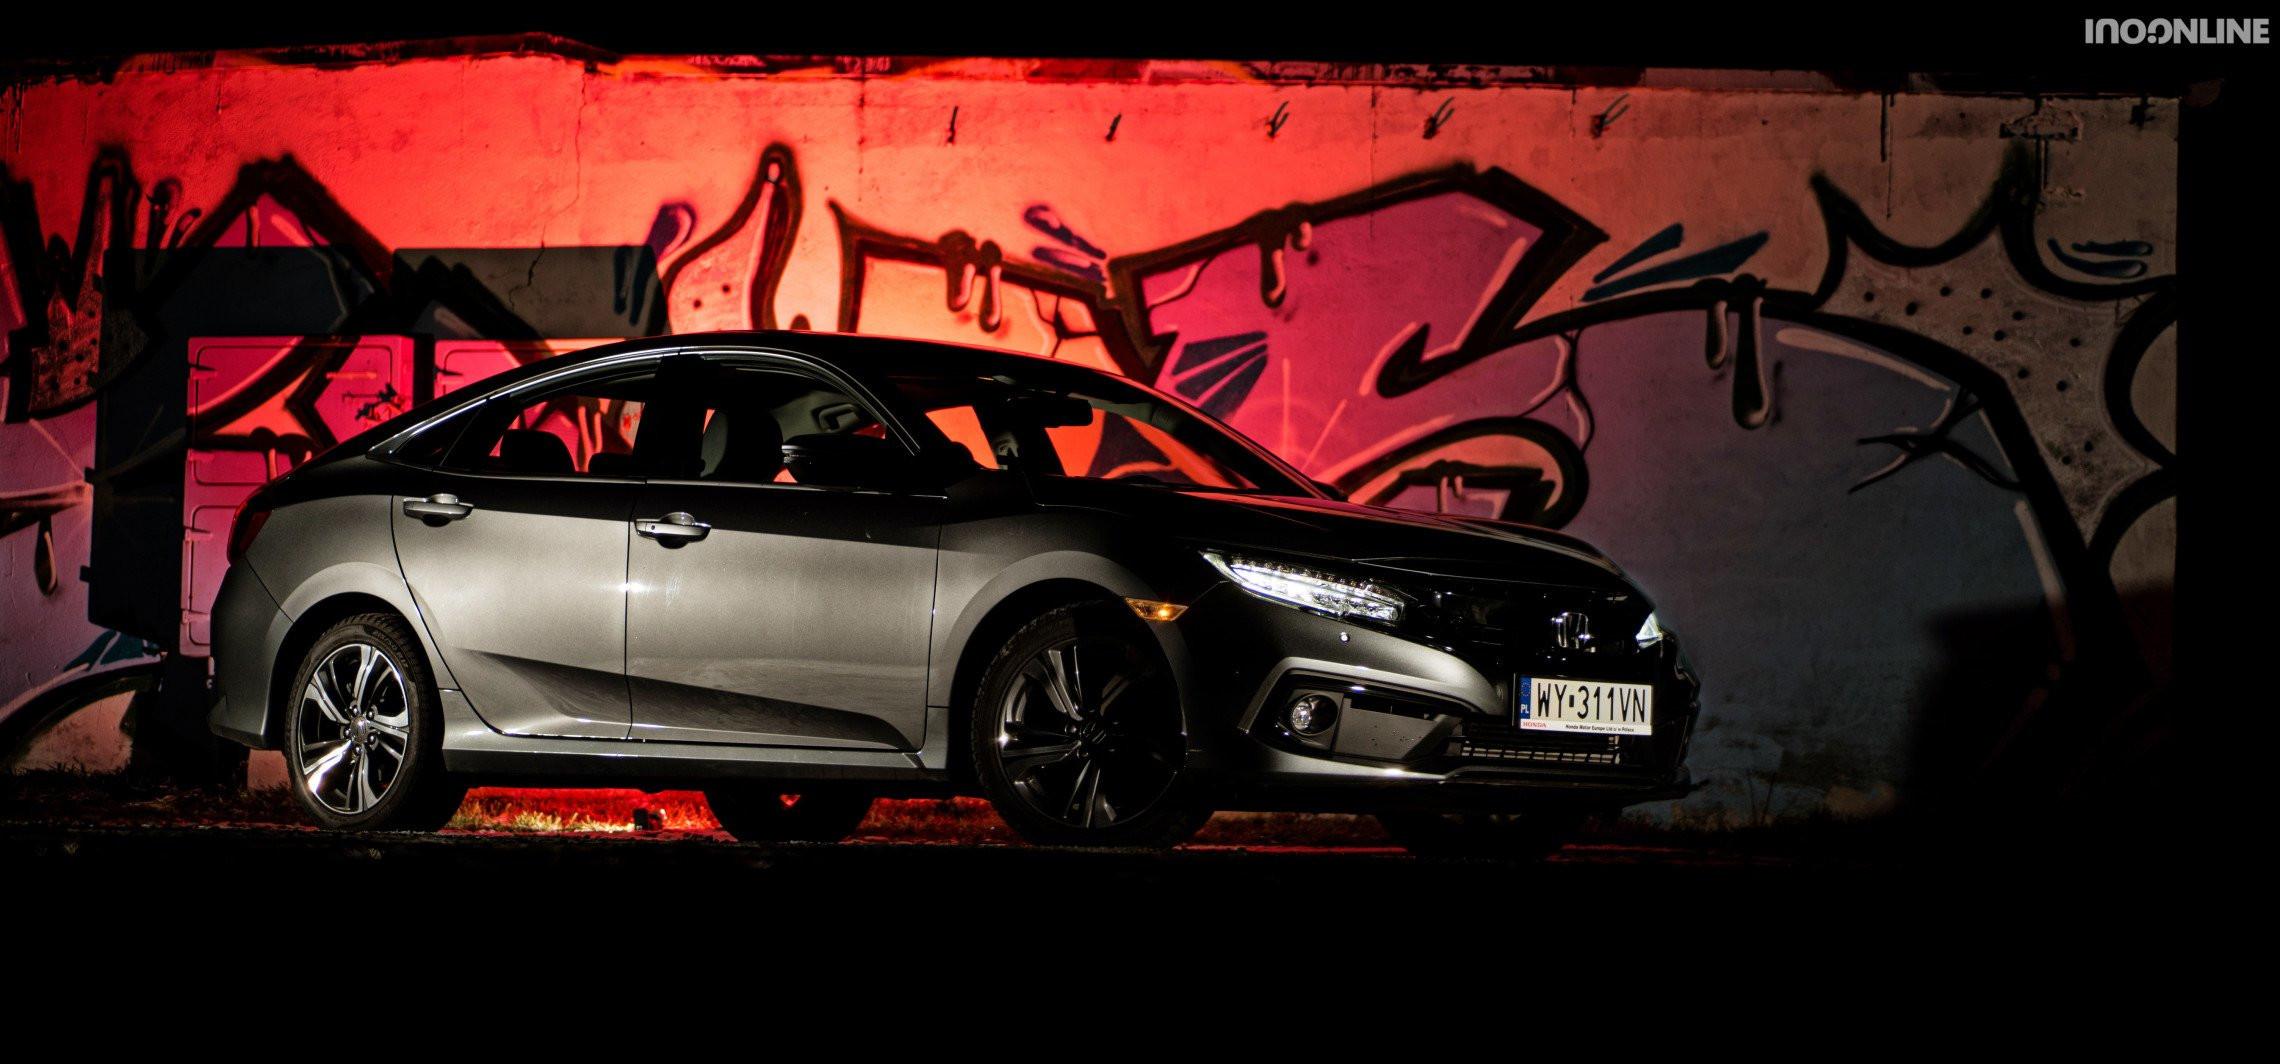 Honda Civic - kompakt dla indywidualistów?